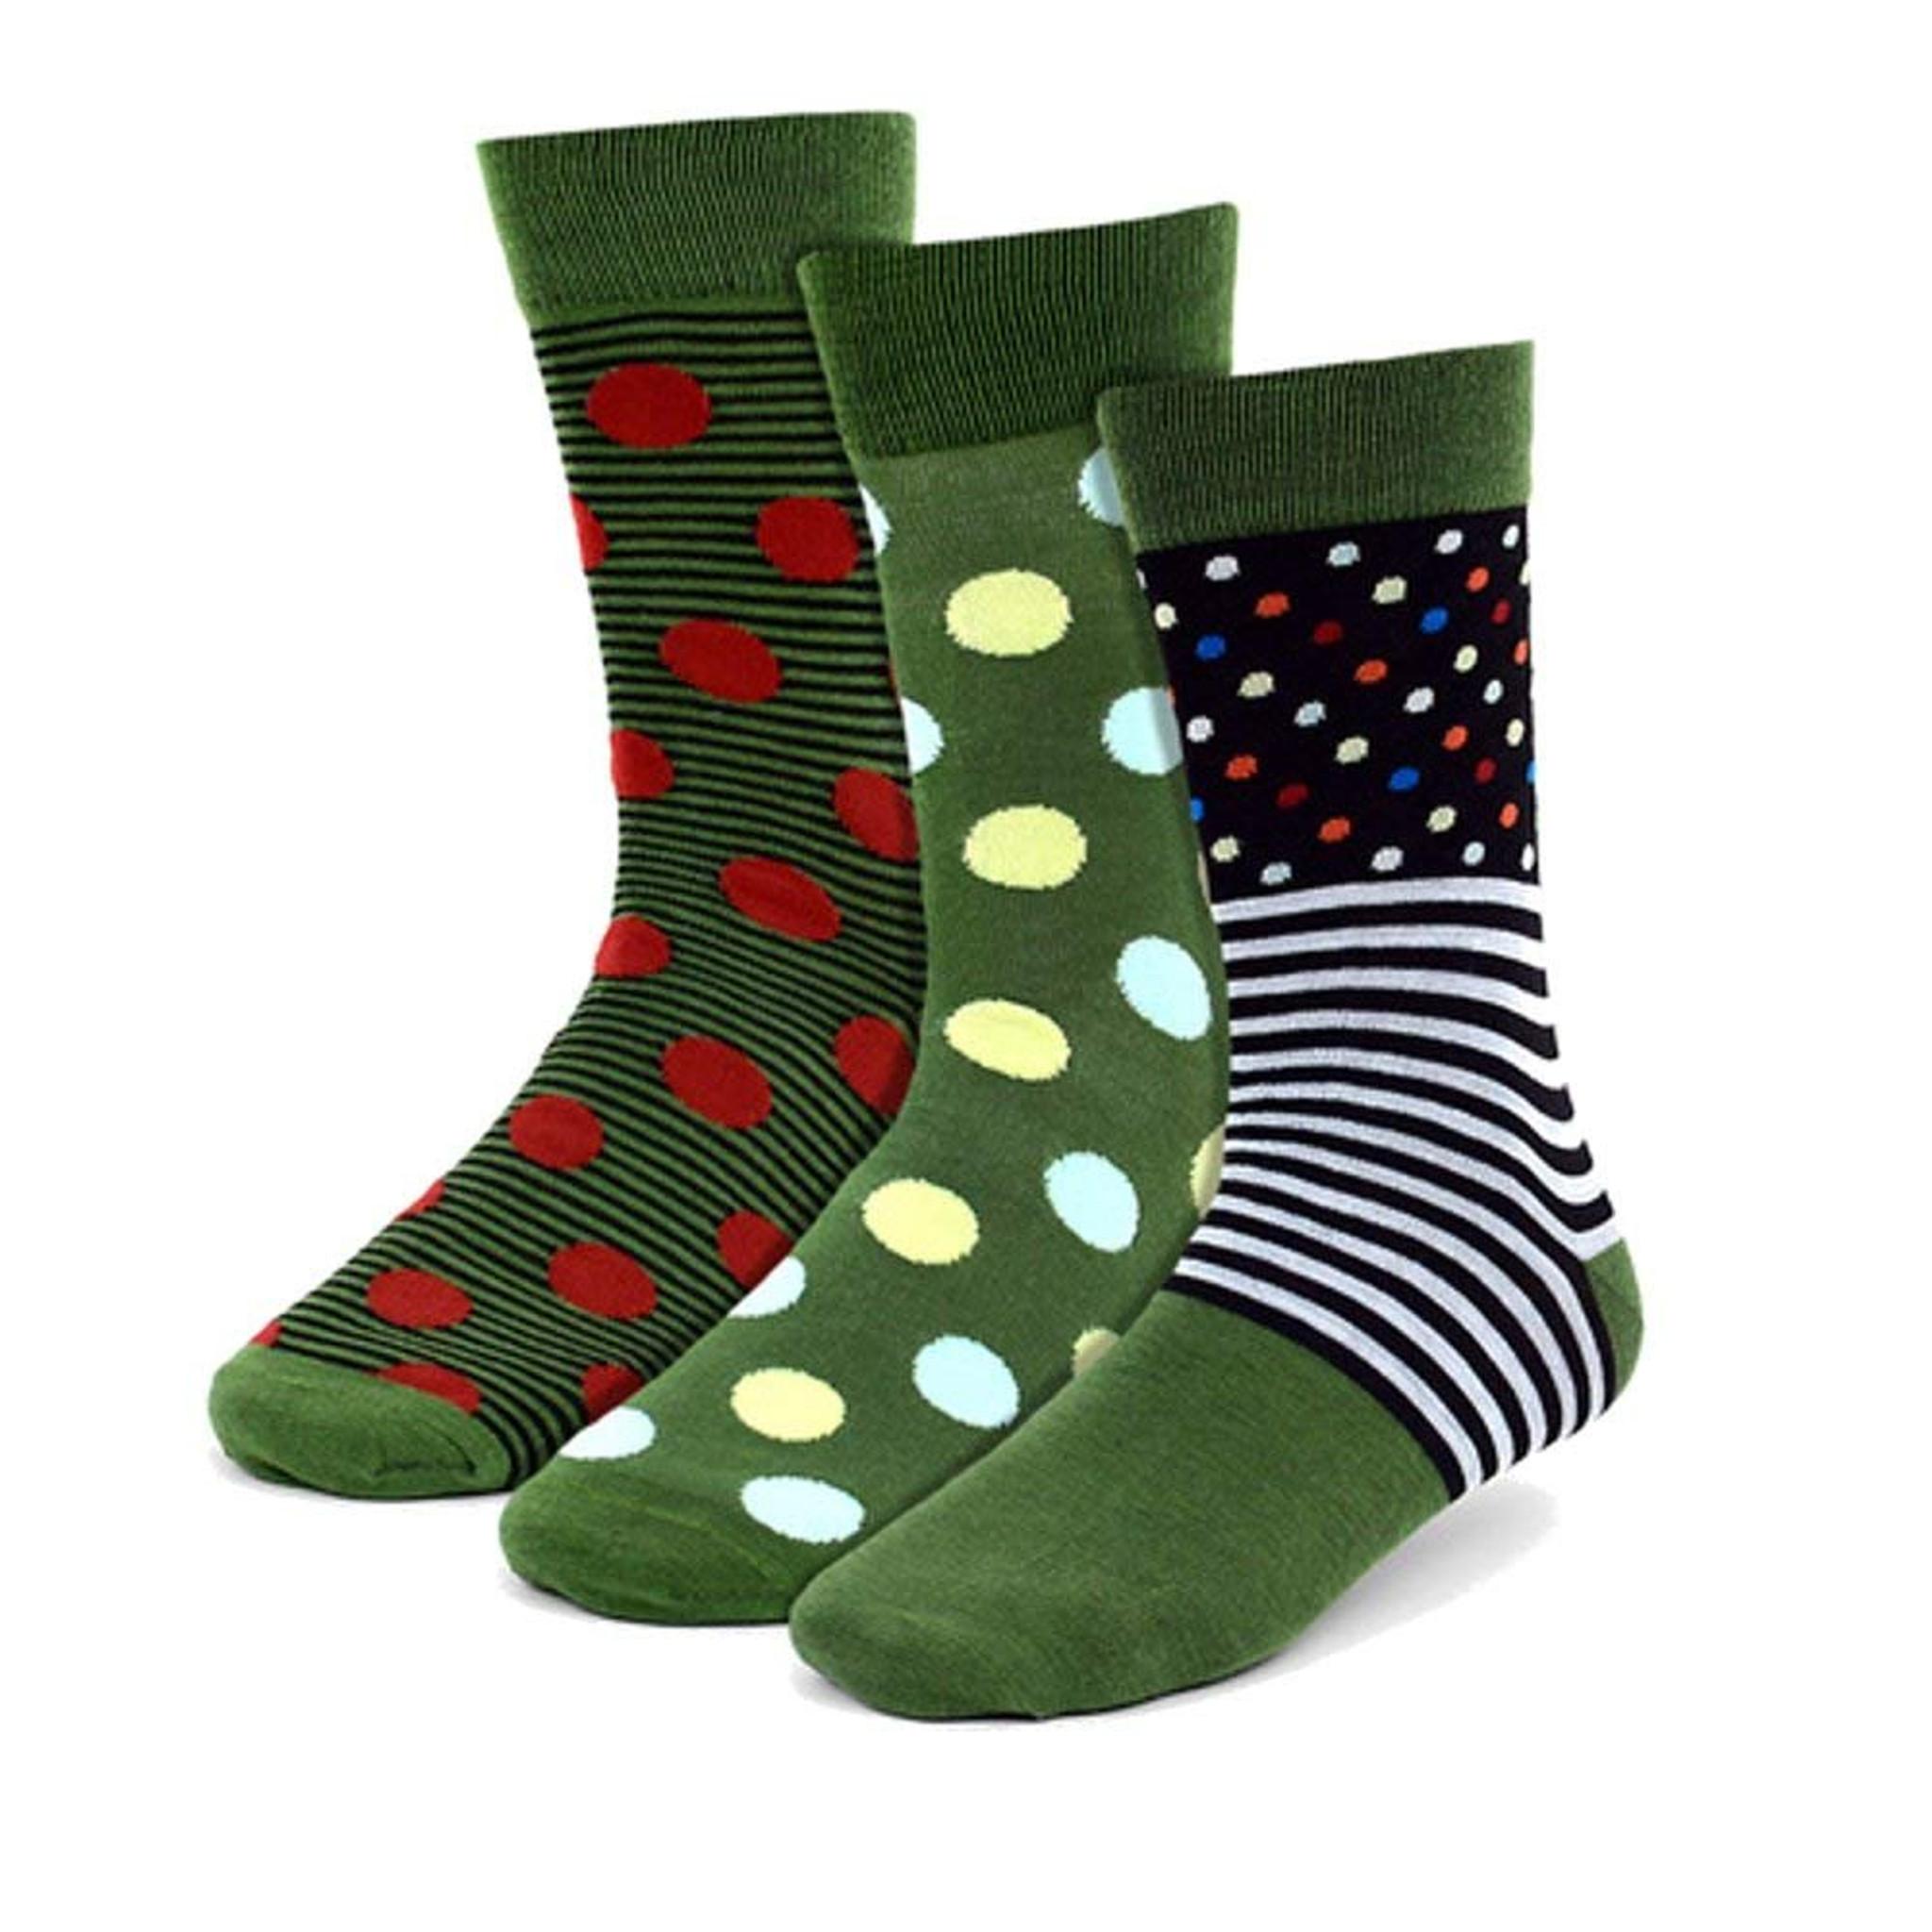 473f19160c3da Men's Premium Green 3 Pairs of Fun Polka Dots & Stripes Novelty Crew Dress  Socks - BOXED GIFTS